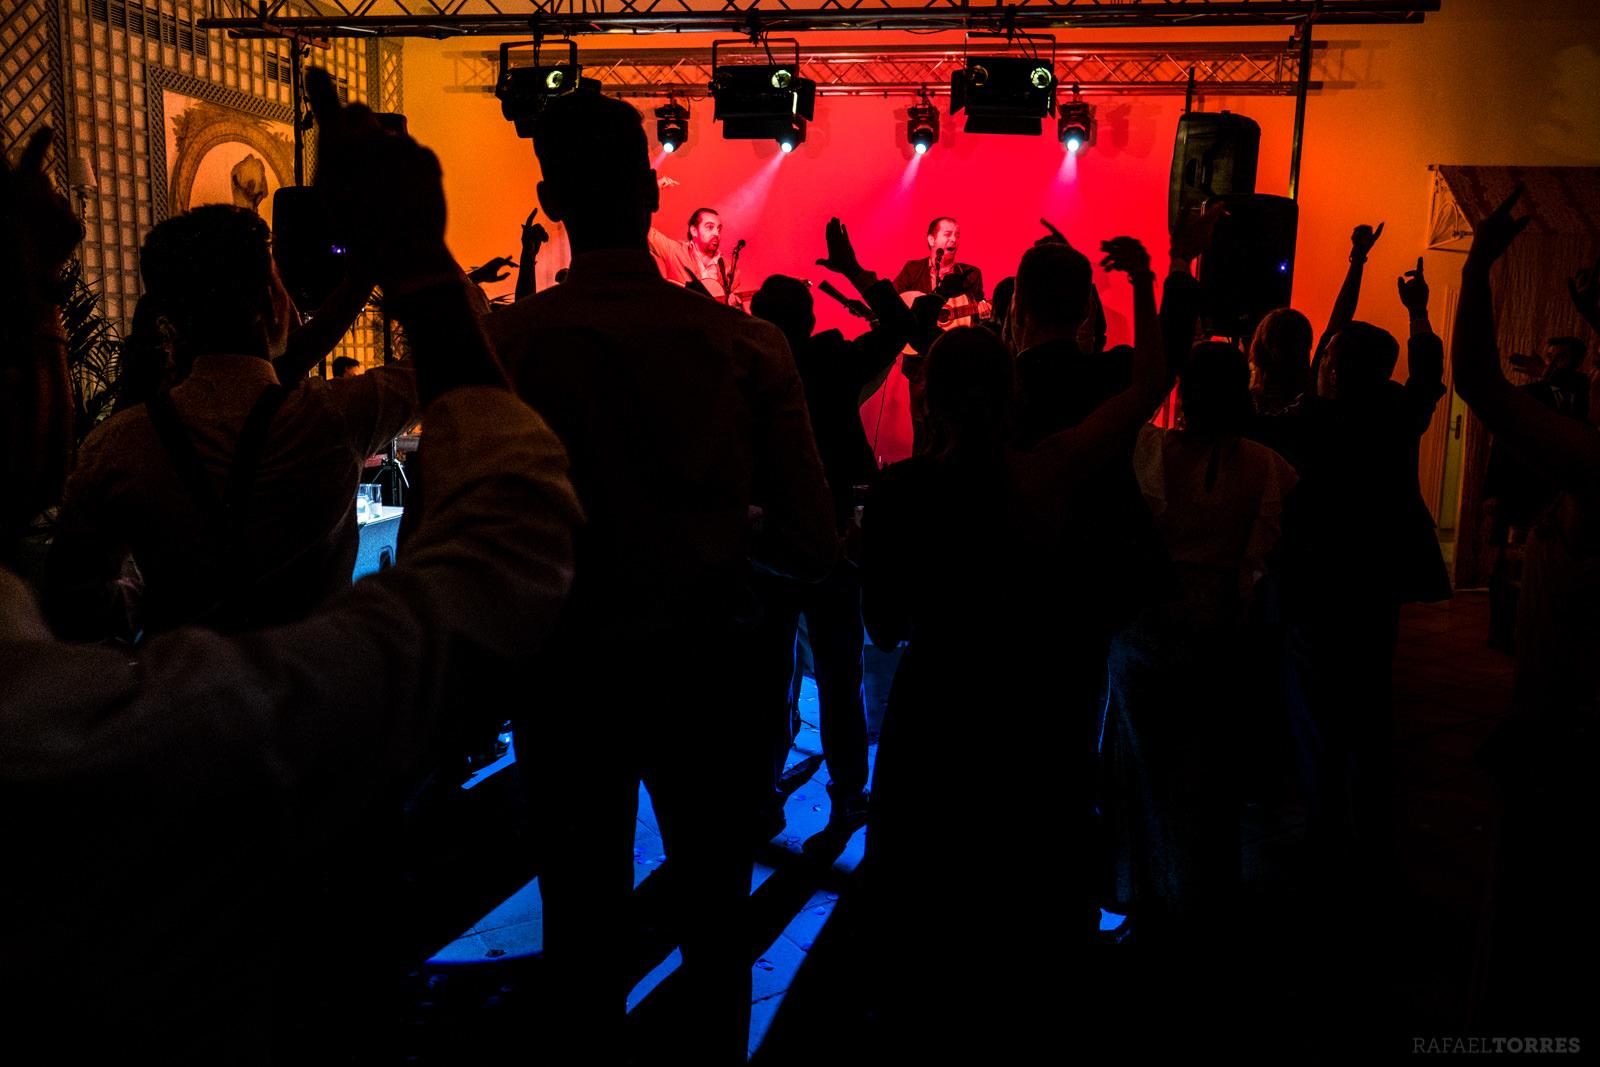 Rafael+Torres+fotografo+bodas+sevilla+madrid+barcelona+wedding+photographer+bodas+diferentes+bodaensevilla+molinillos+fotografo+hacienda+oran+alfonso+wedding+photographer-37.jpg